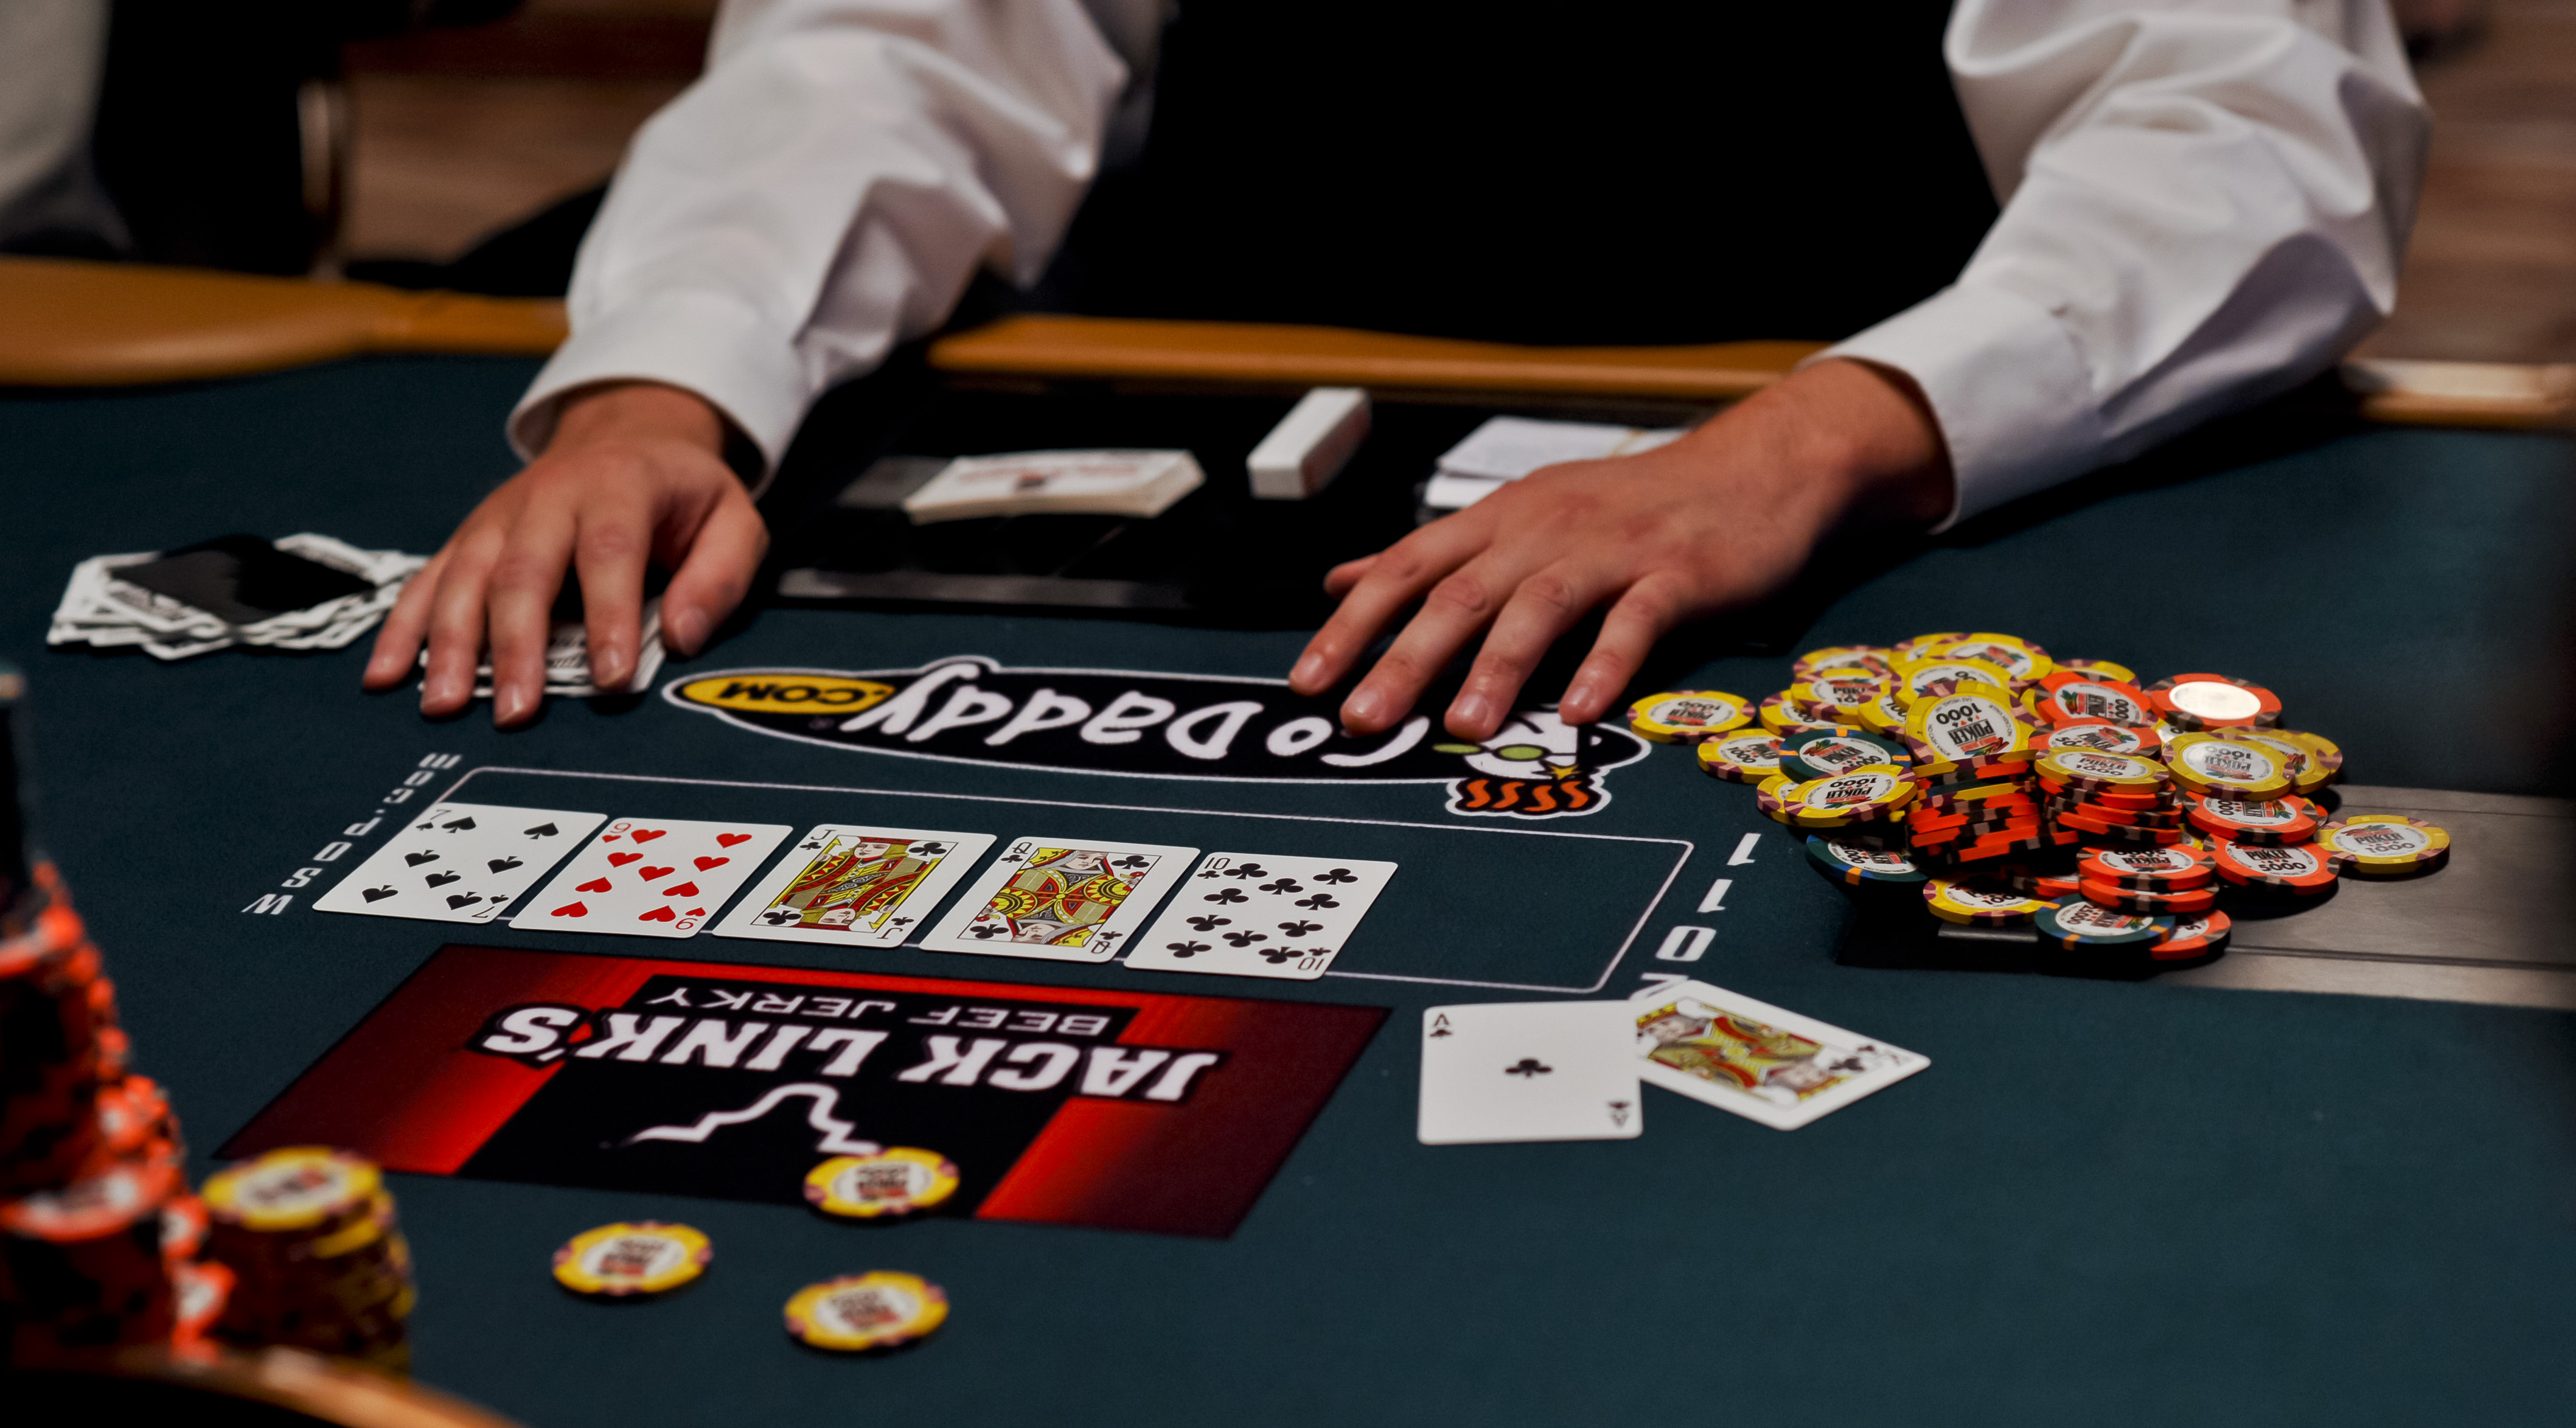 Rules of Poker for beginners